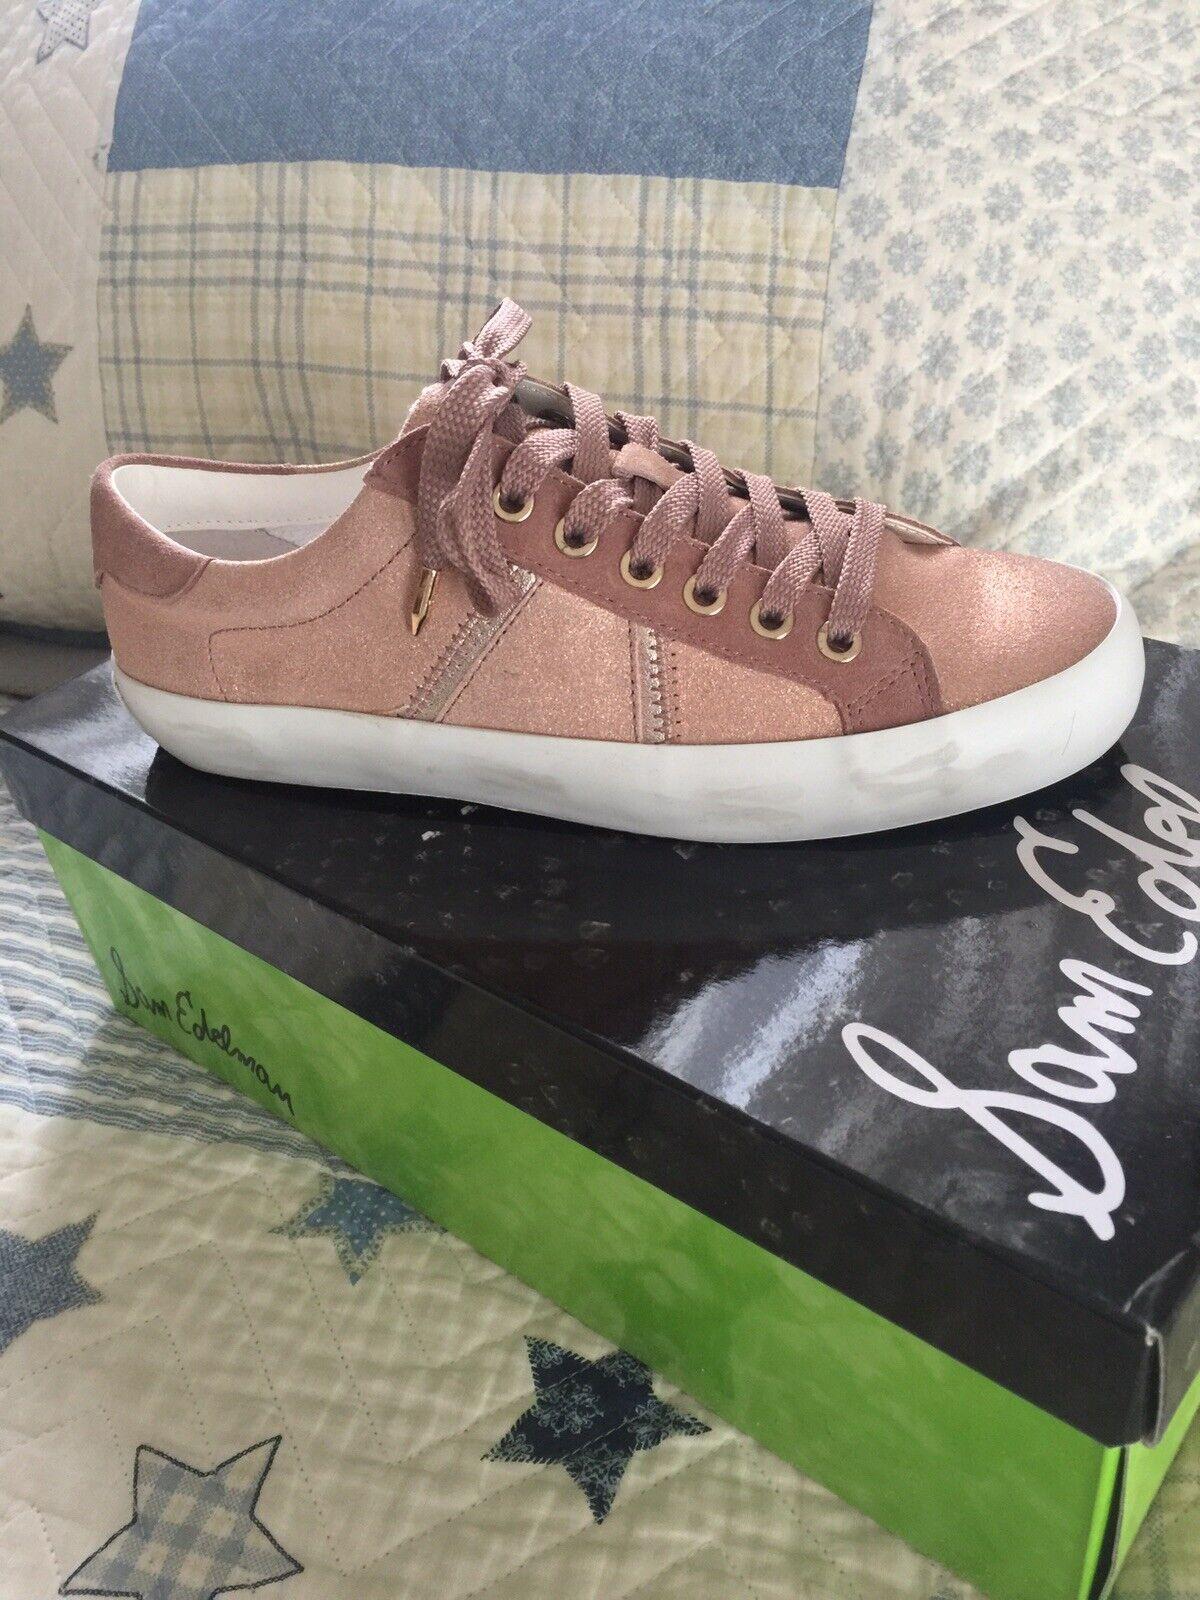 Sam Sam Sam Edelman Baylee Sneaker   bluesh pink    6M f584b2